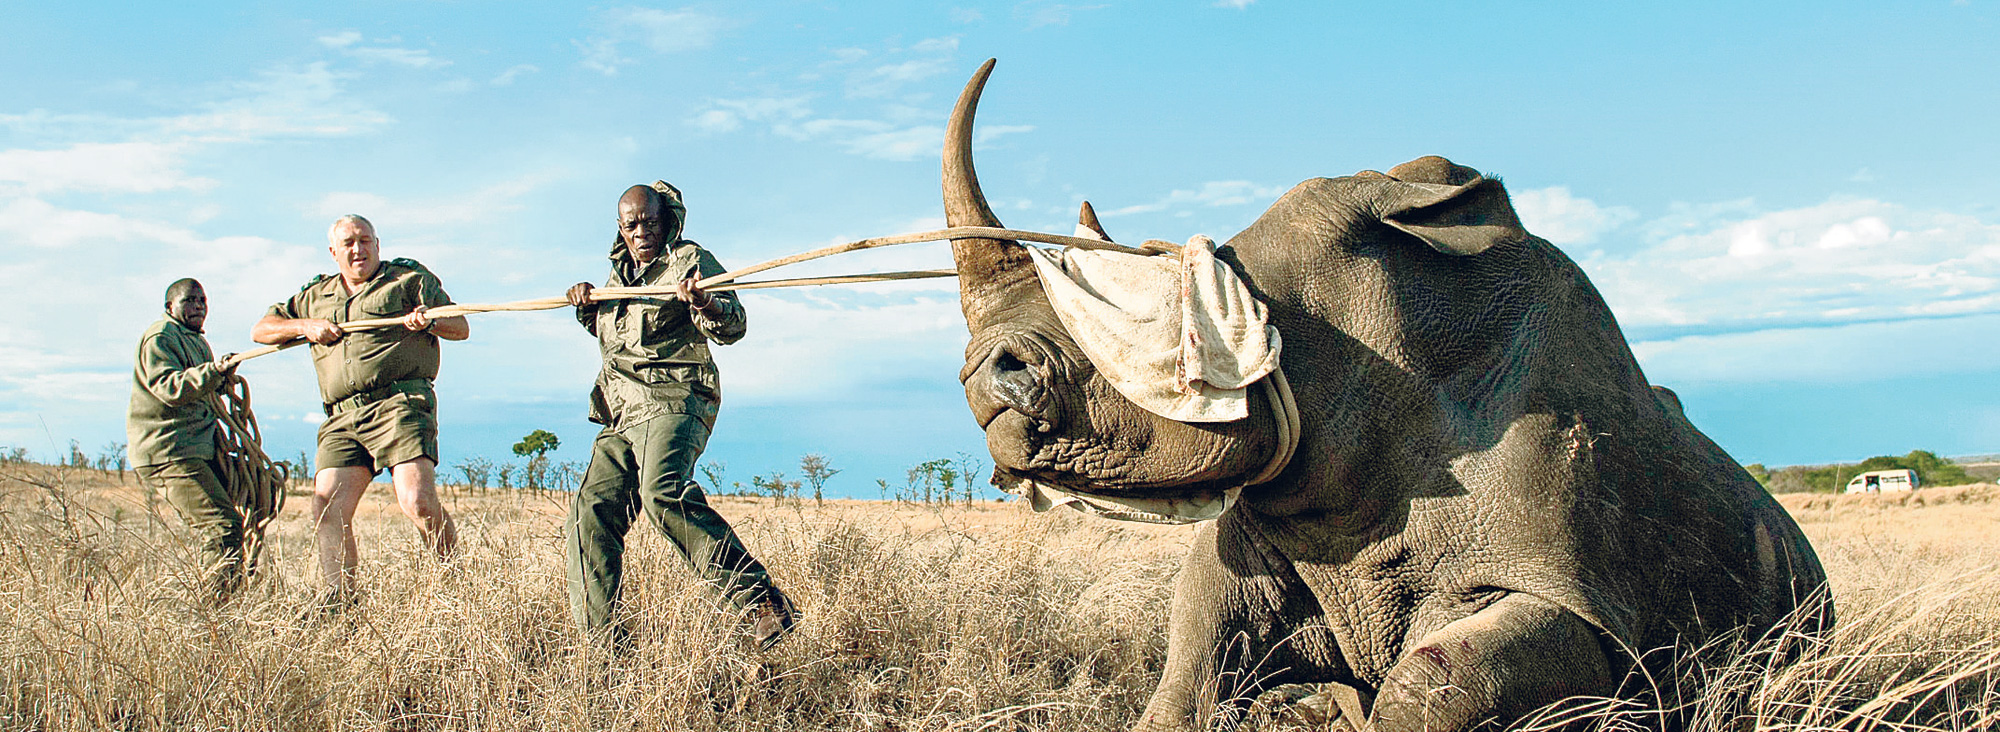 Rinoceronte191014